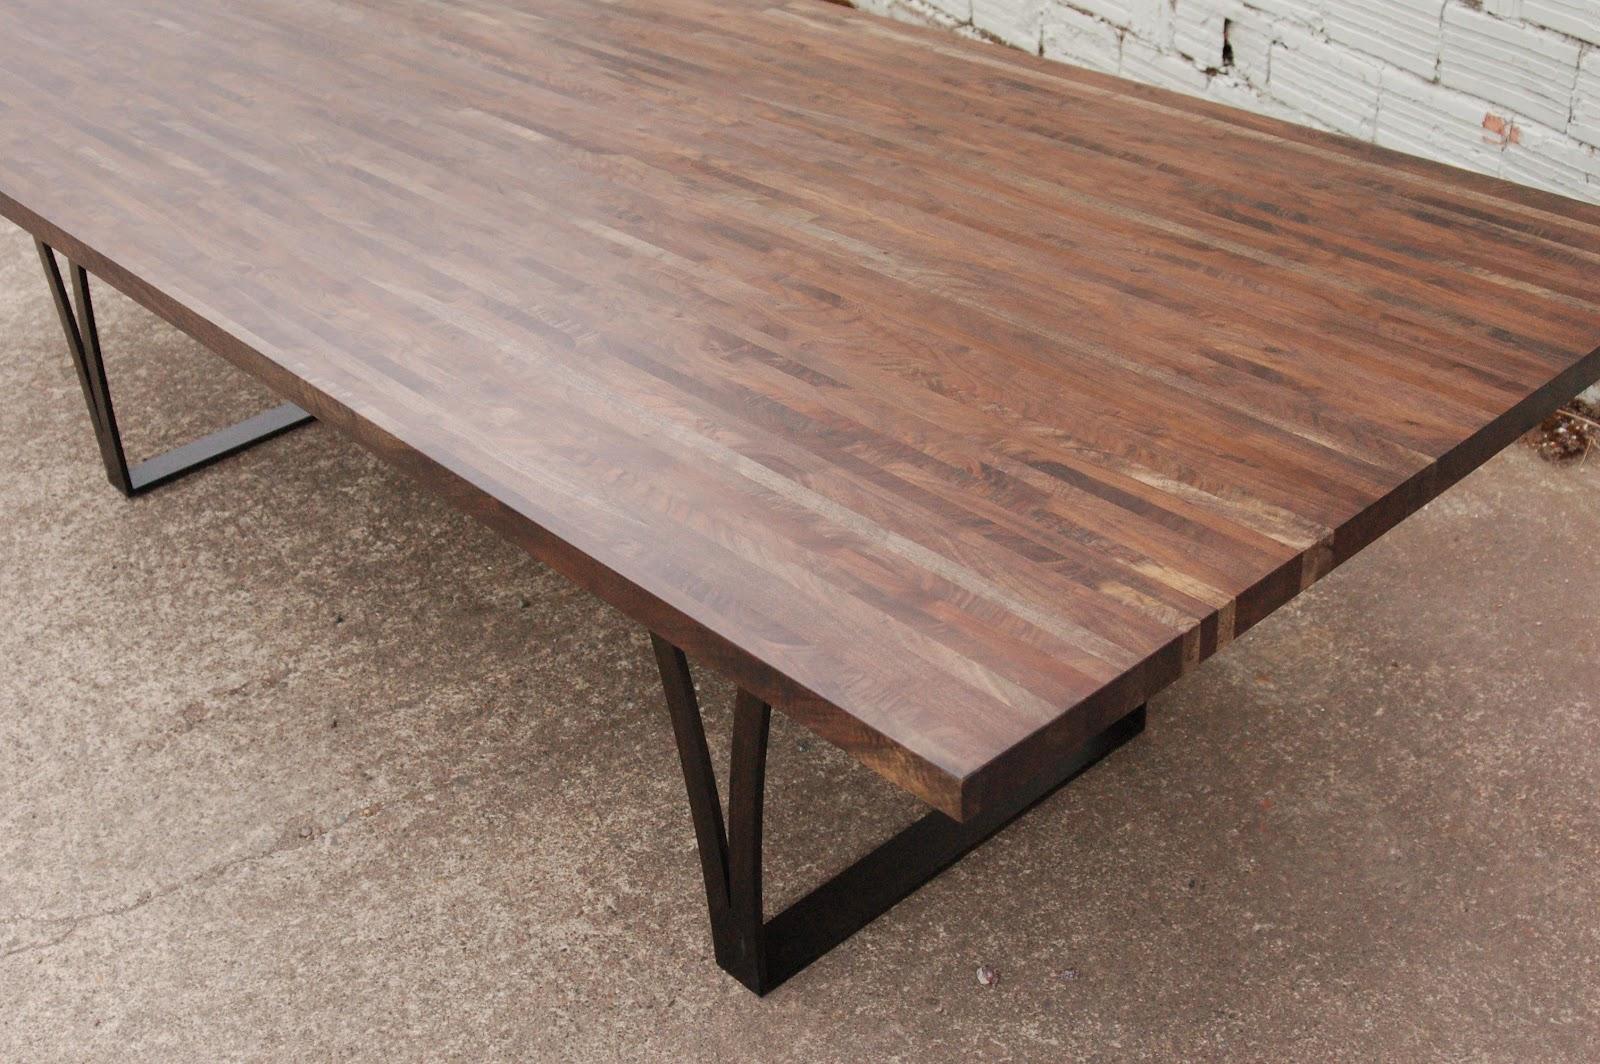 Deadfall oregon black walnut dining table and a sideboard ...